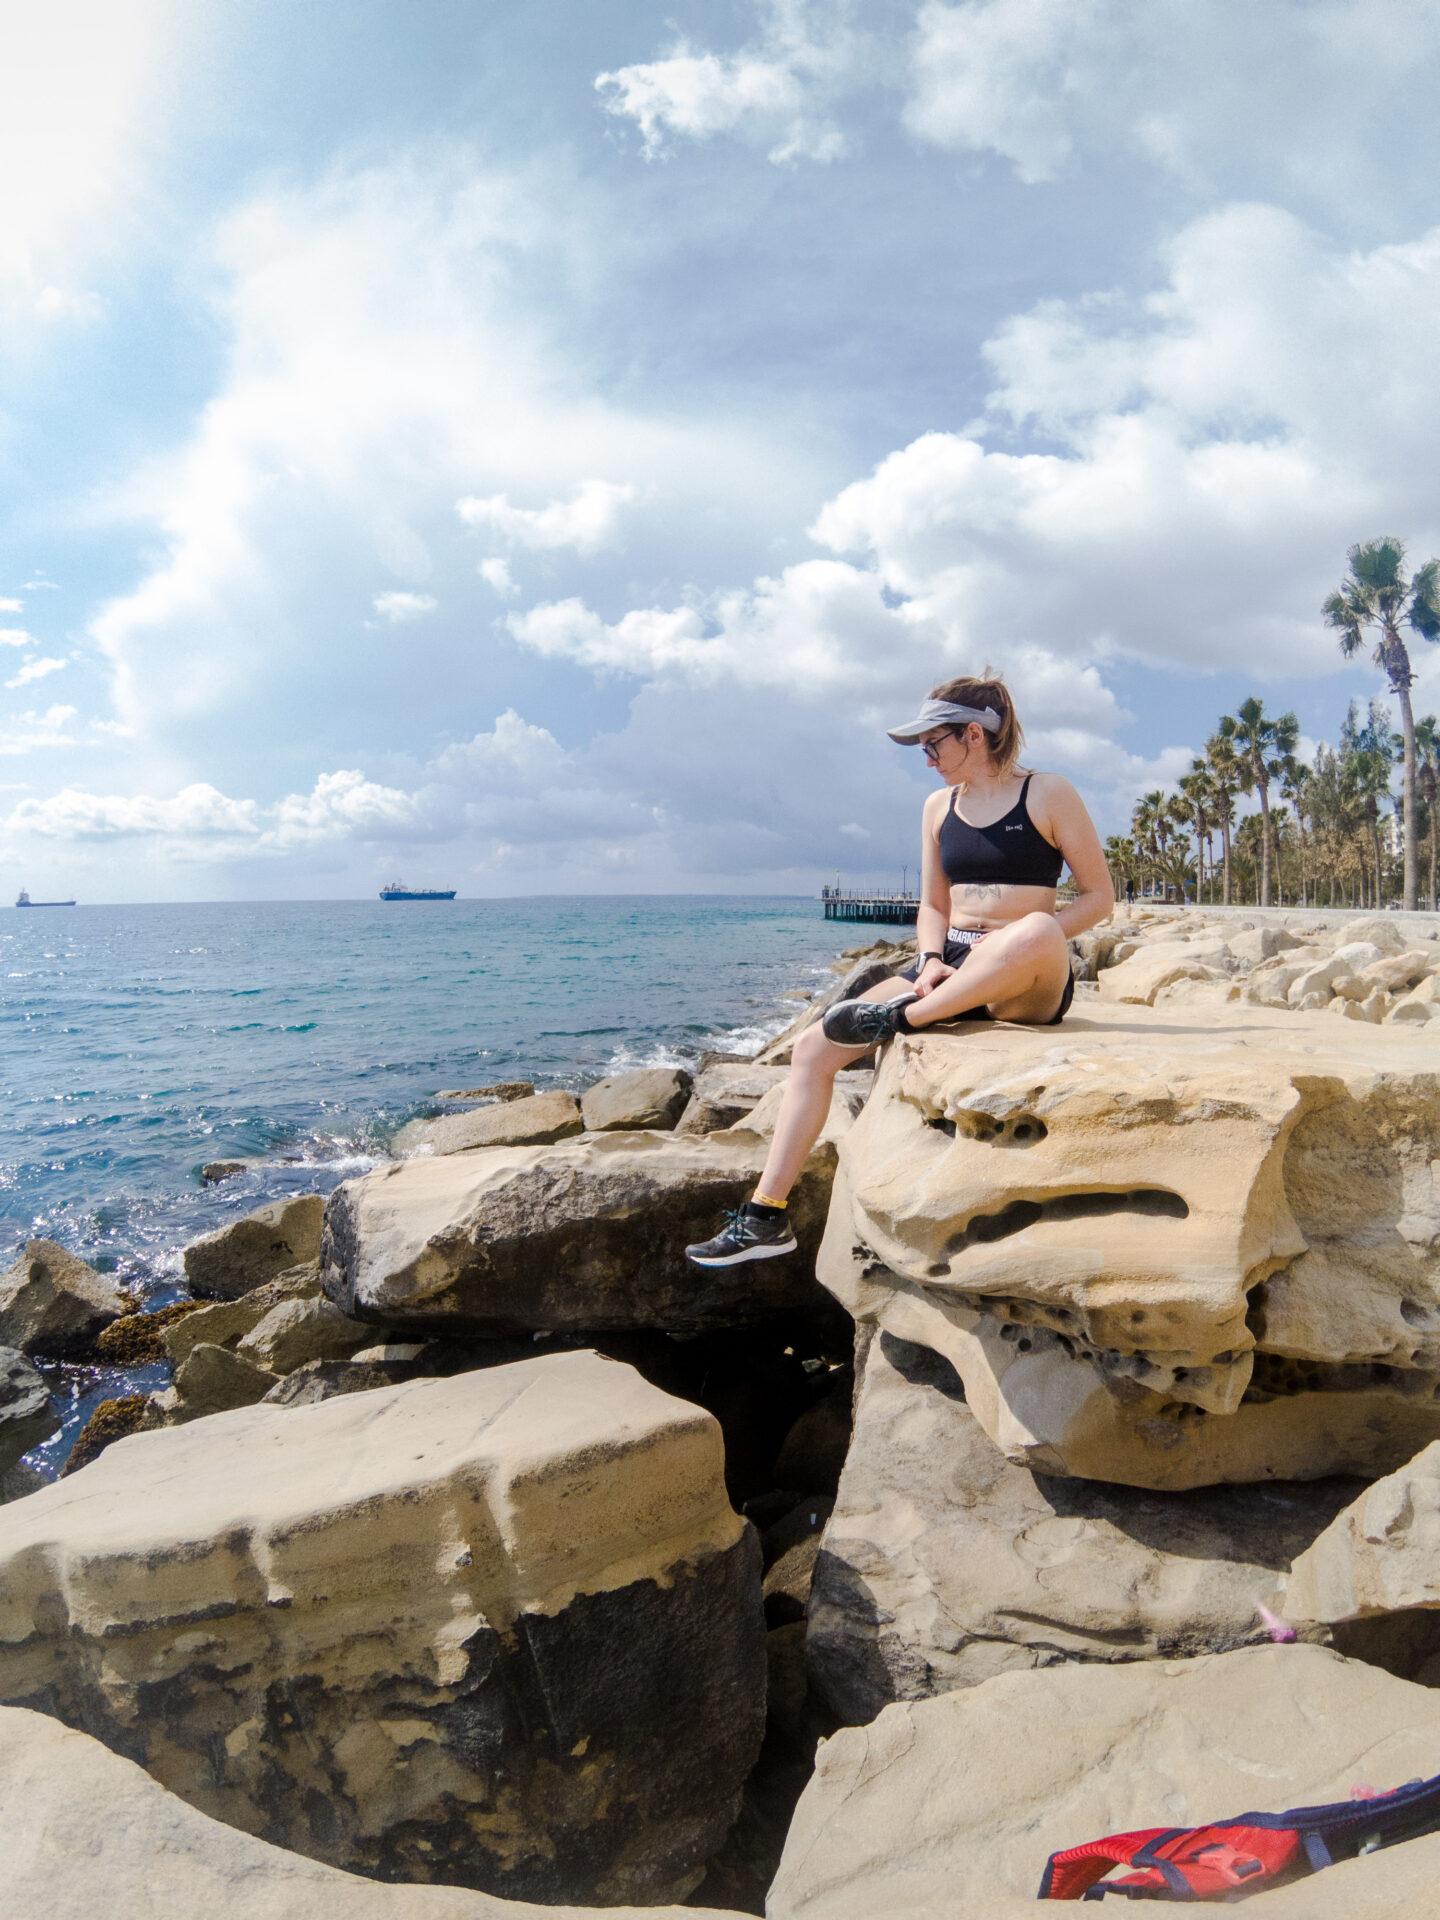 Girl sat in running gear on beach rocks.